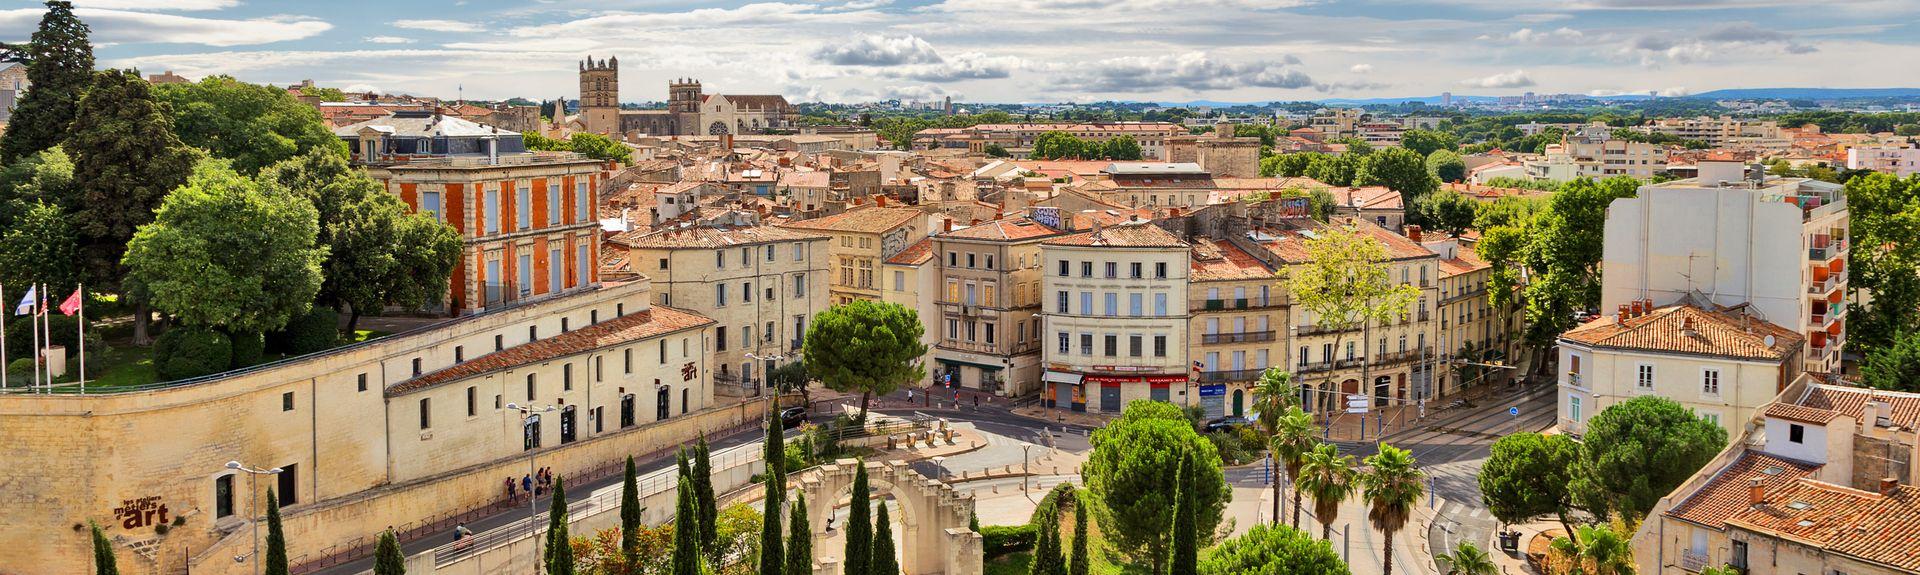 Occitanie, France